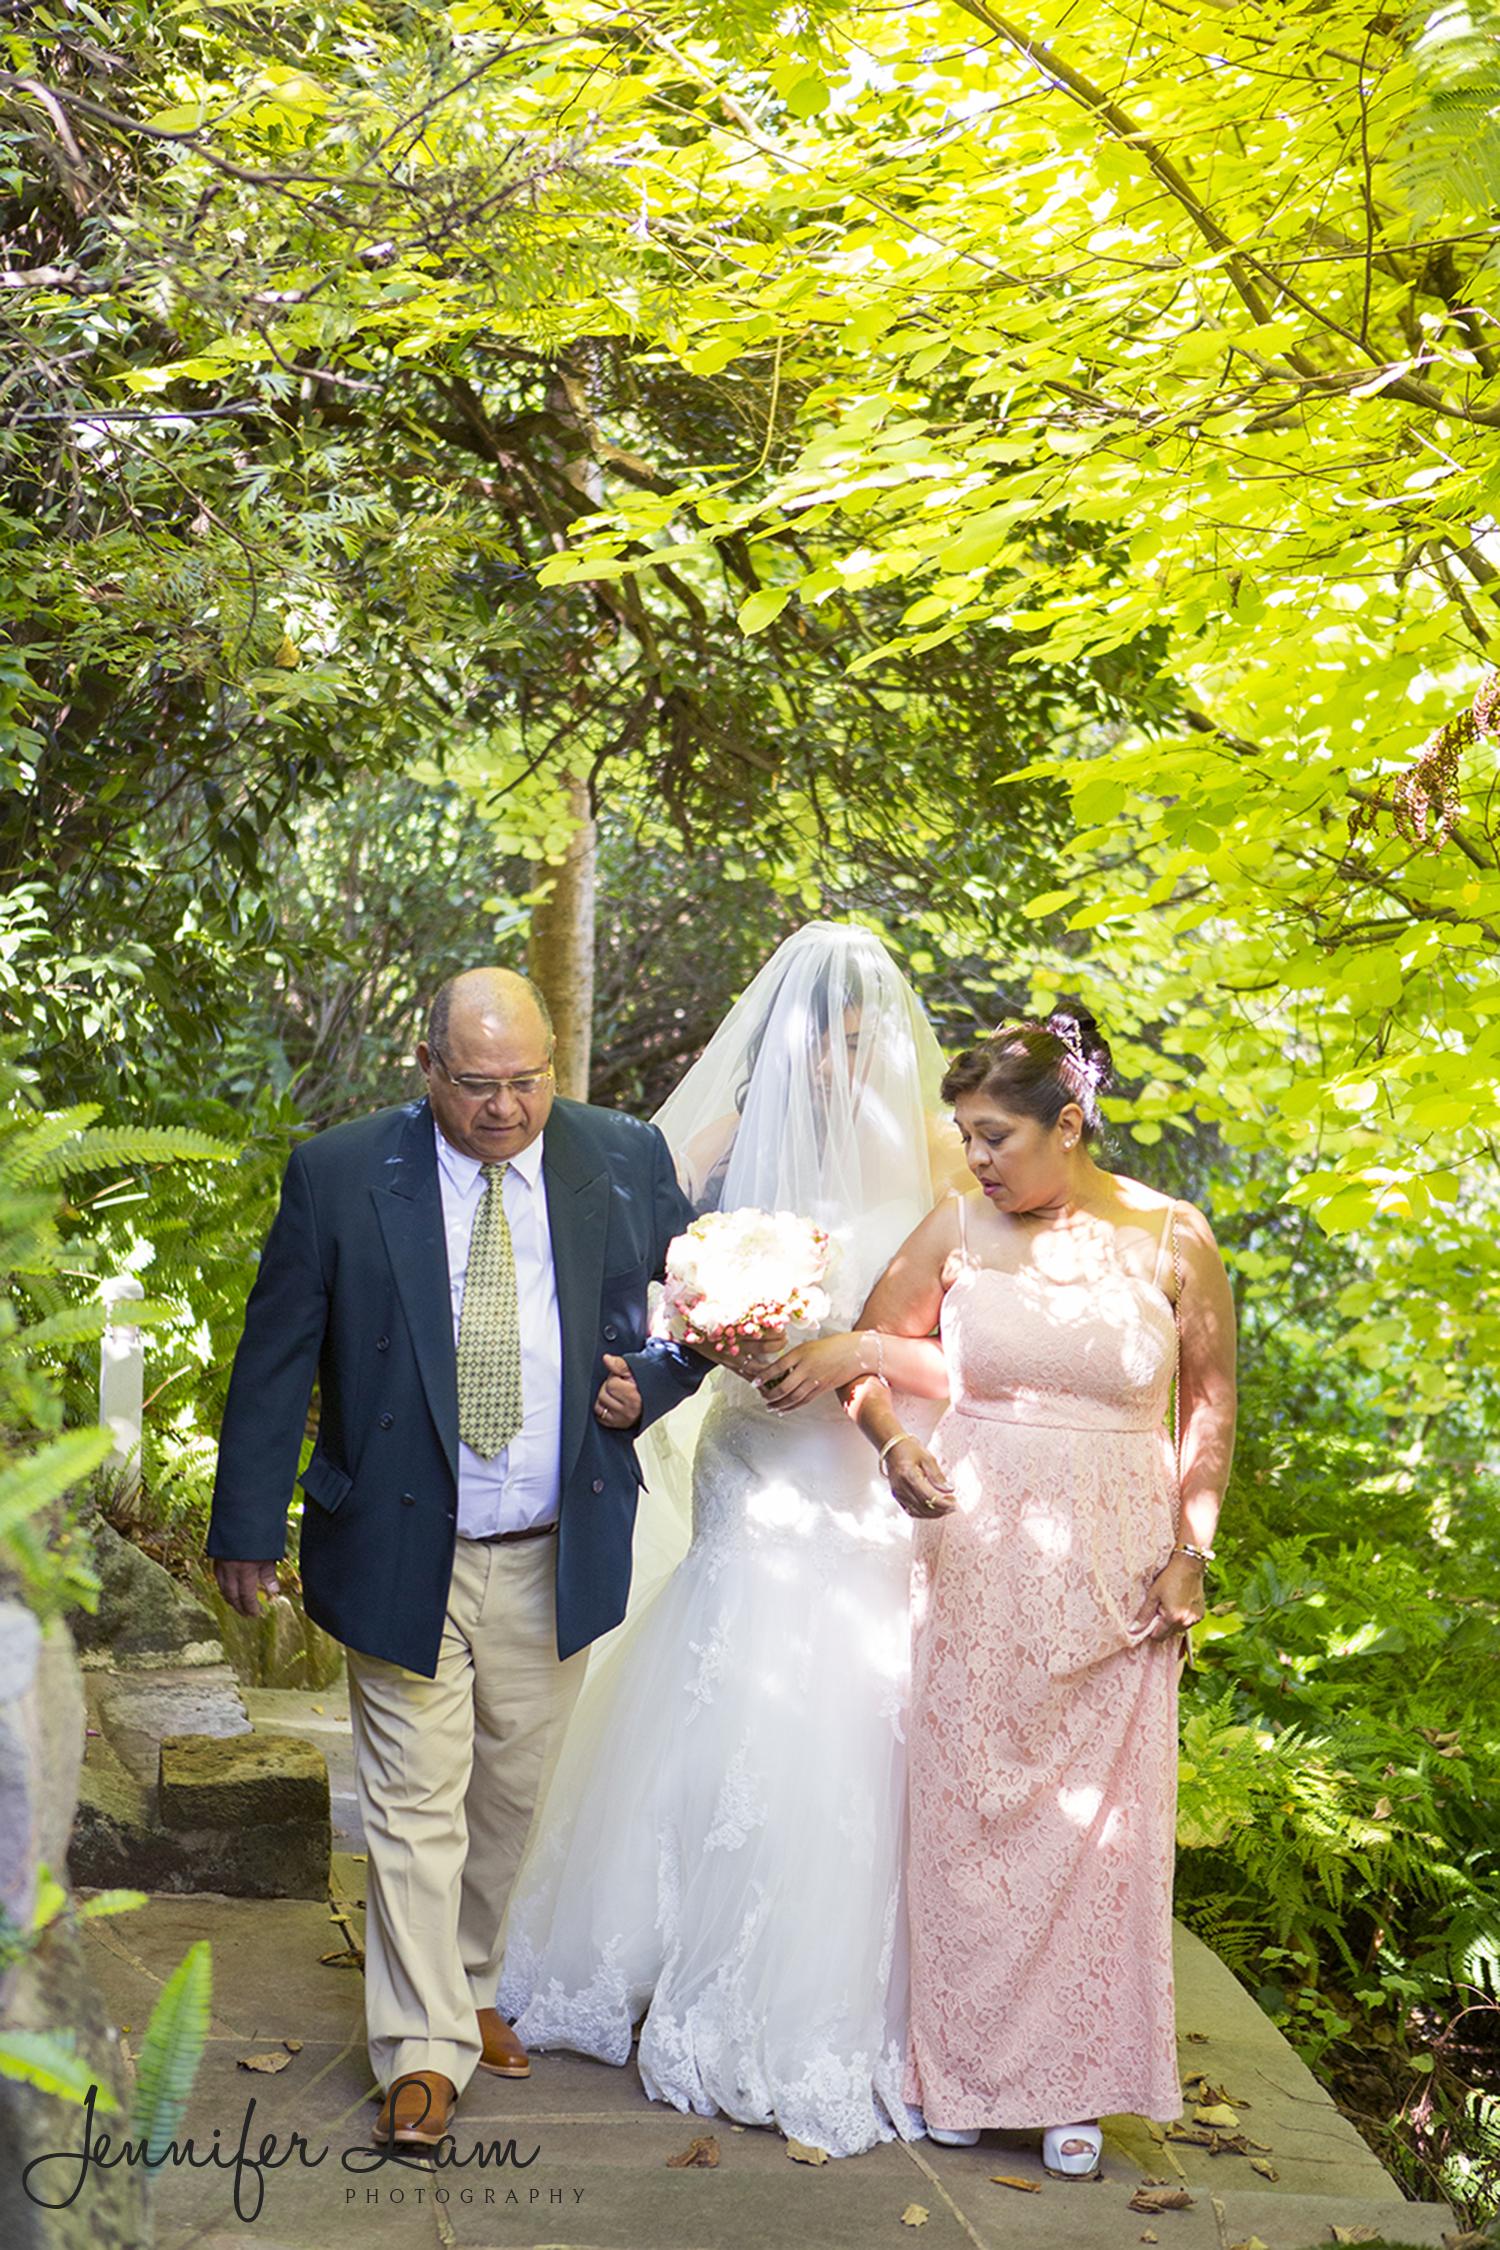 Sydney Wedding Photographer - Jennifer Lam Photography - www.jenniferlamphotography (24).jpg